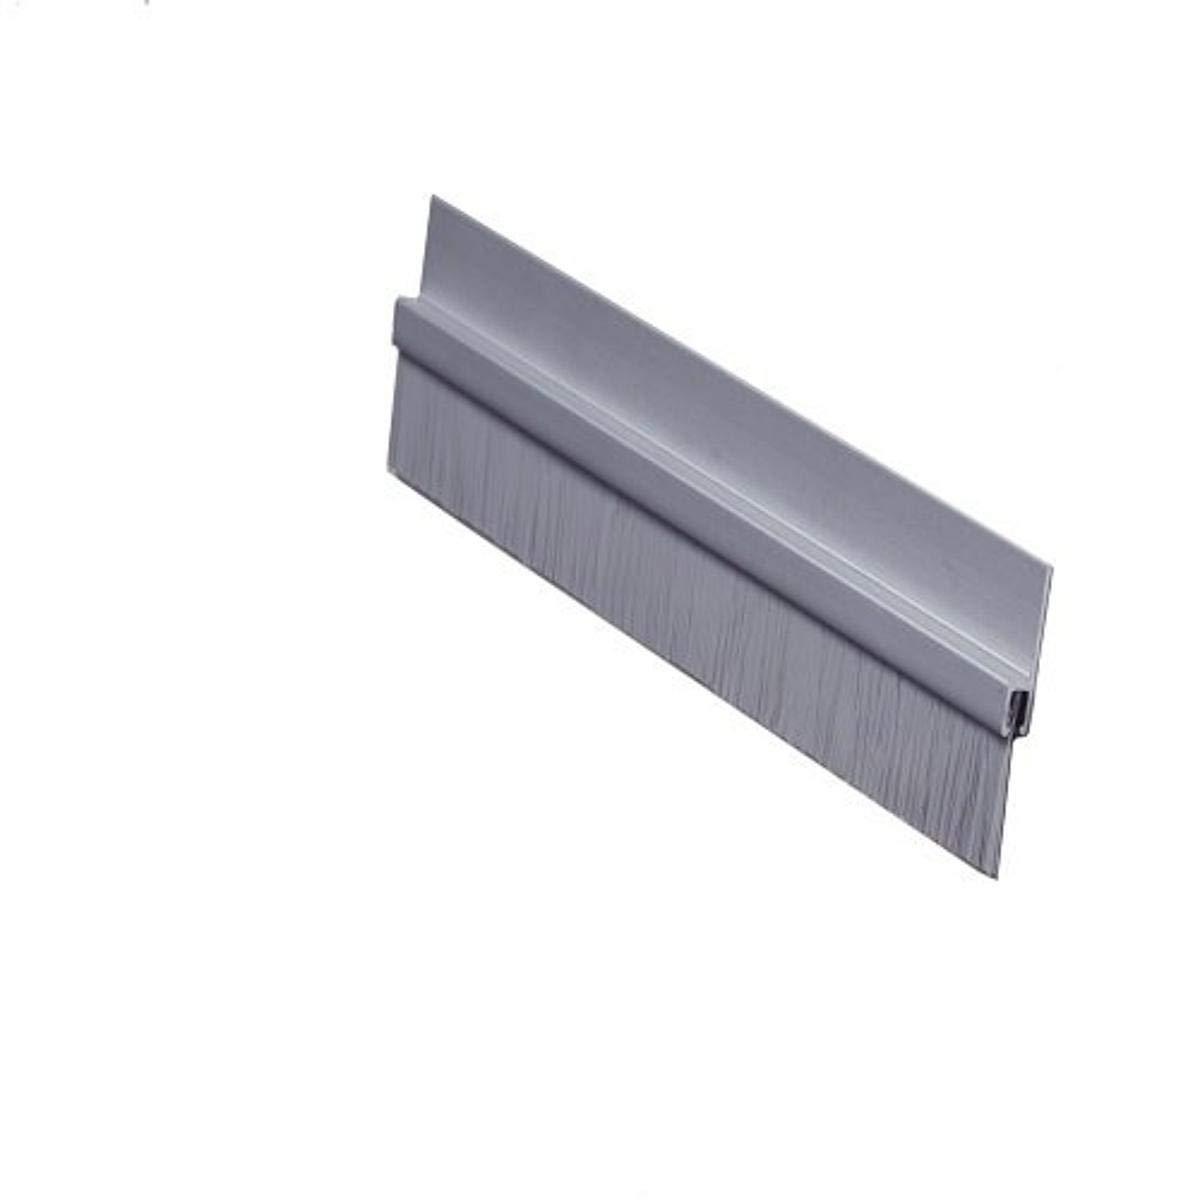 Pemko - Kansas City Mall 18061CNB36 Brush Door Clear Sweep Bottom Anodized famous Alumi